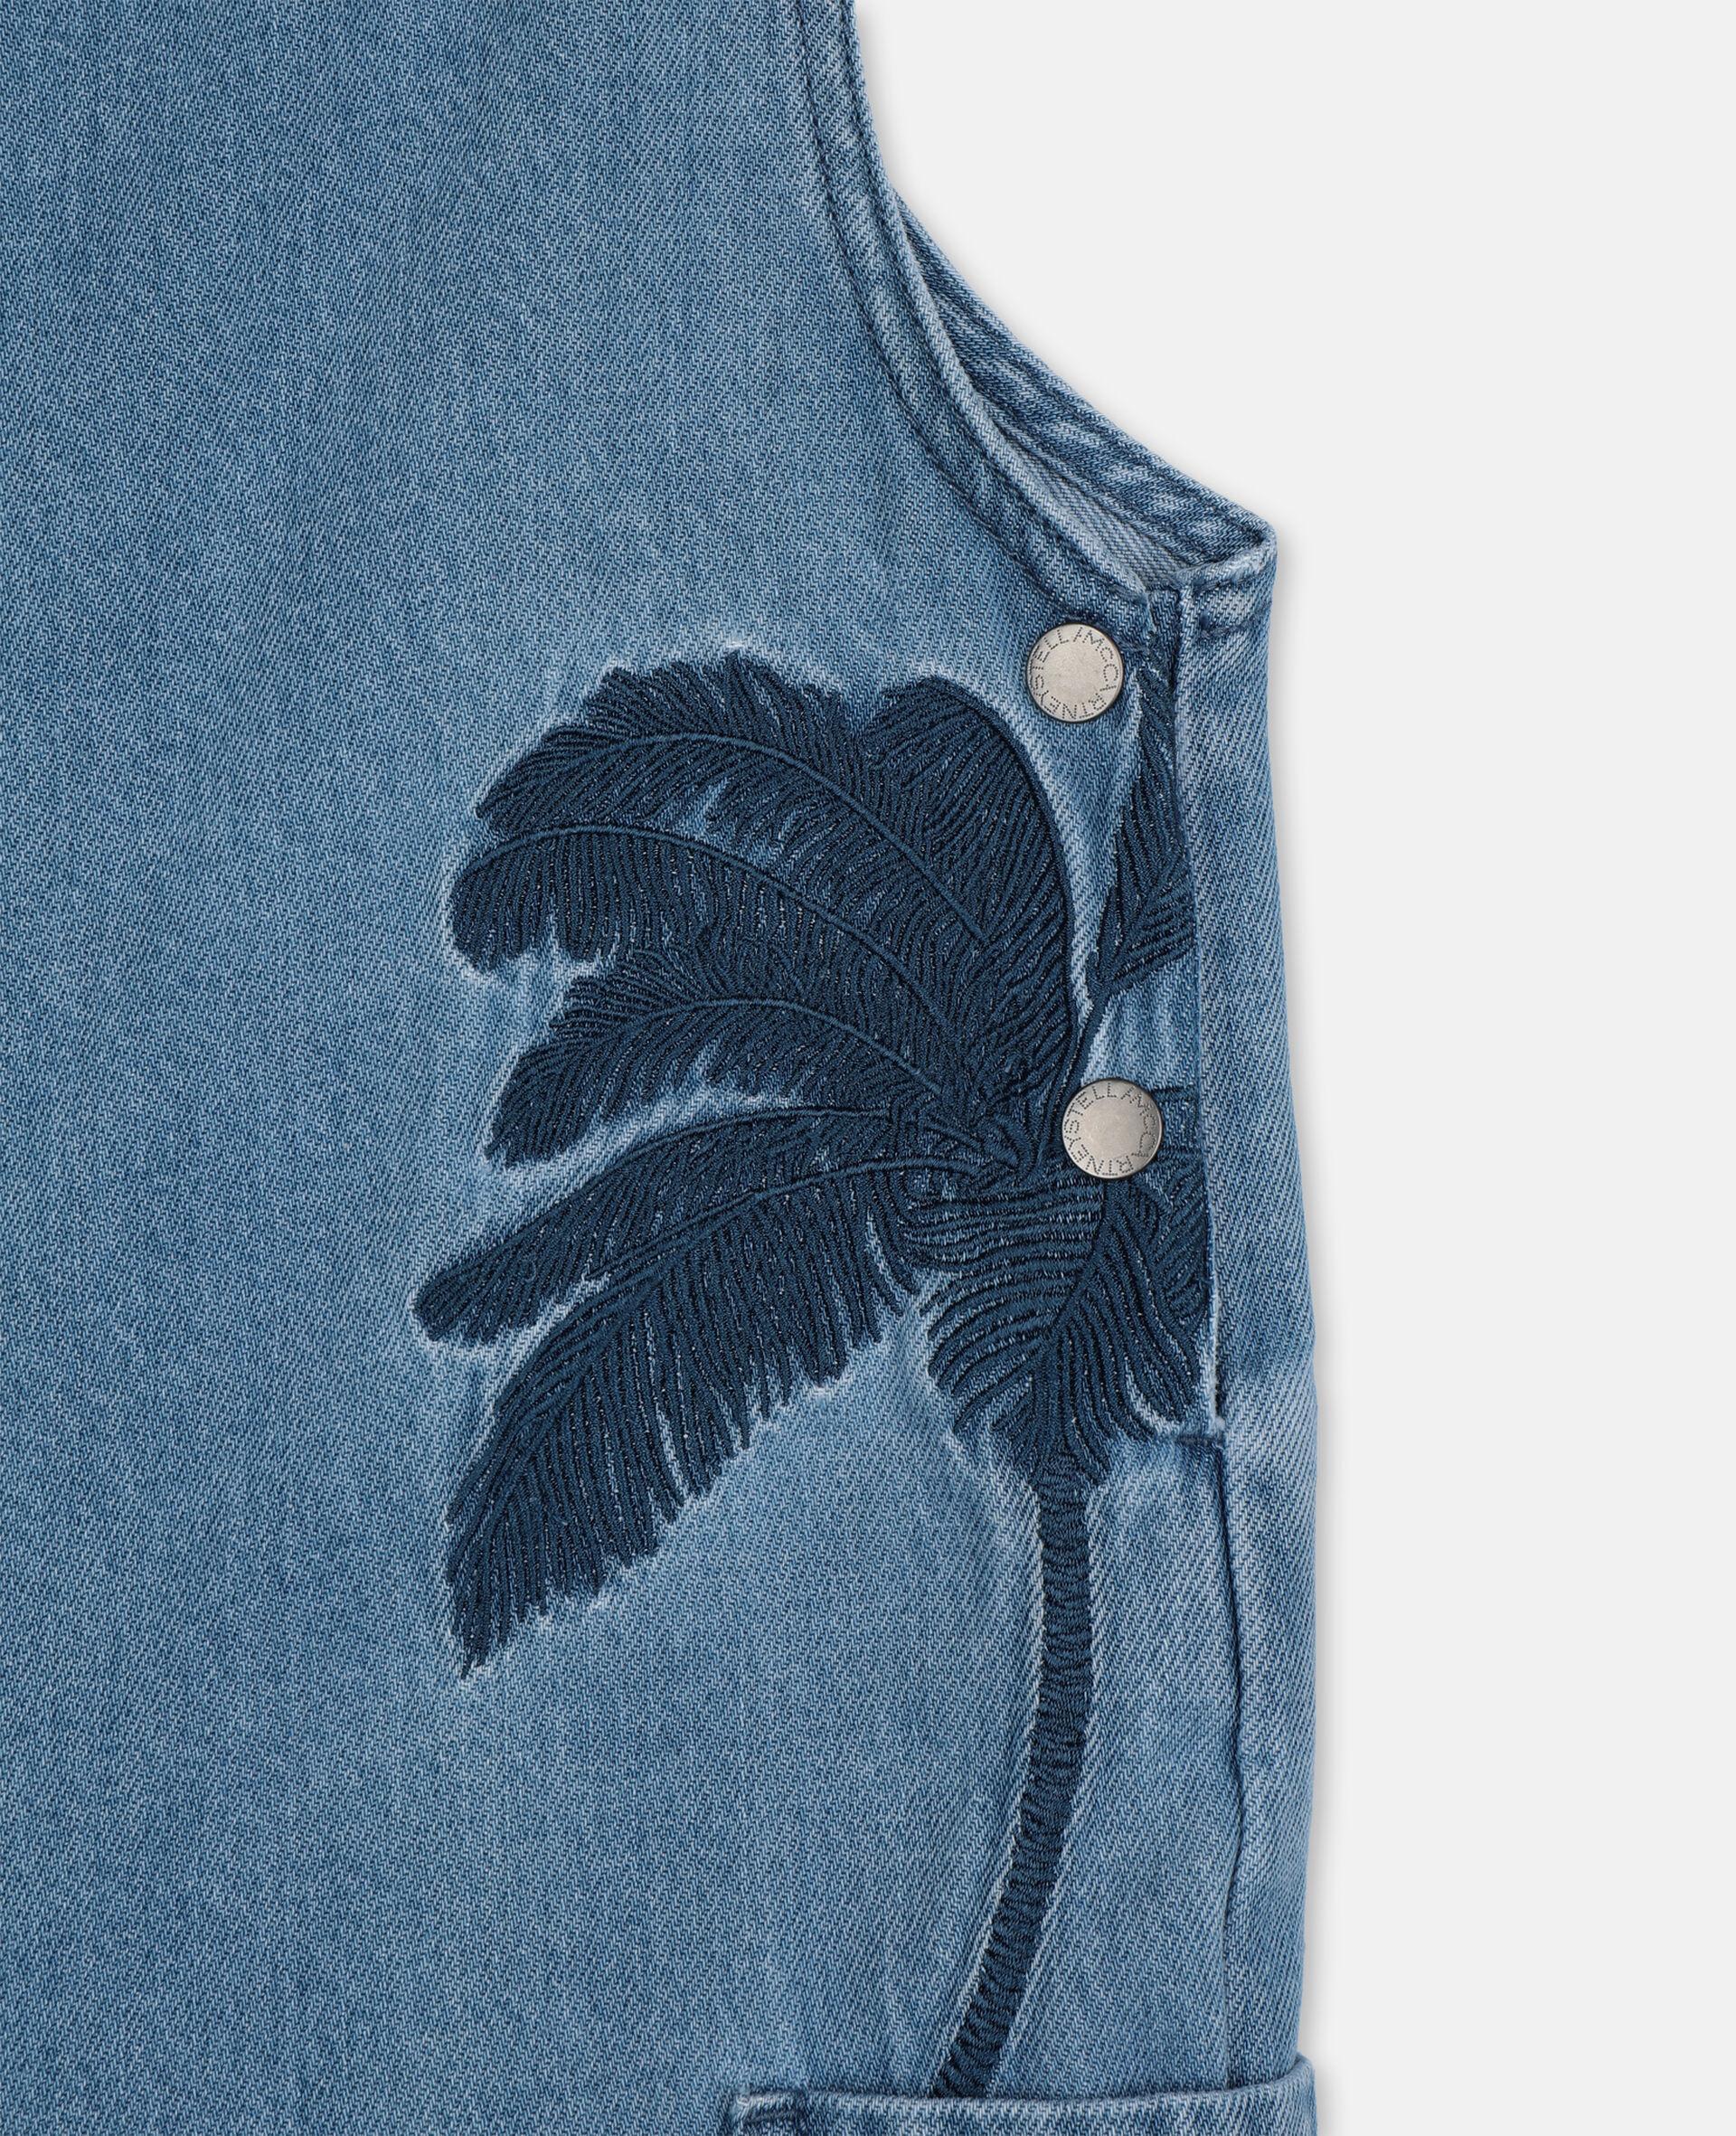 Embroidered Palms Denim Overalls-Blue-large image number 2